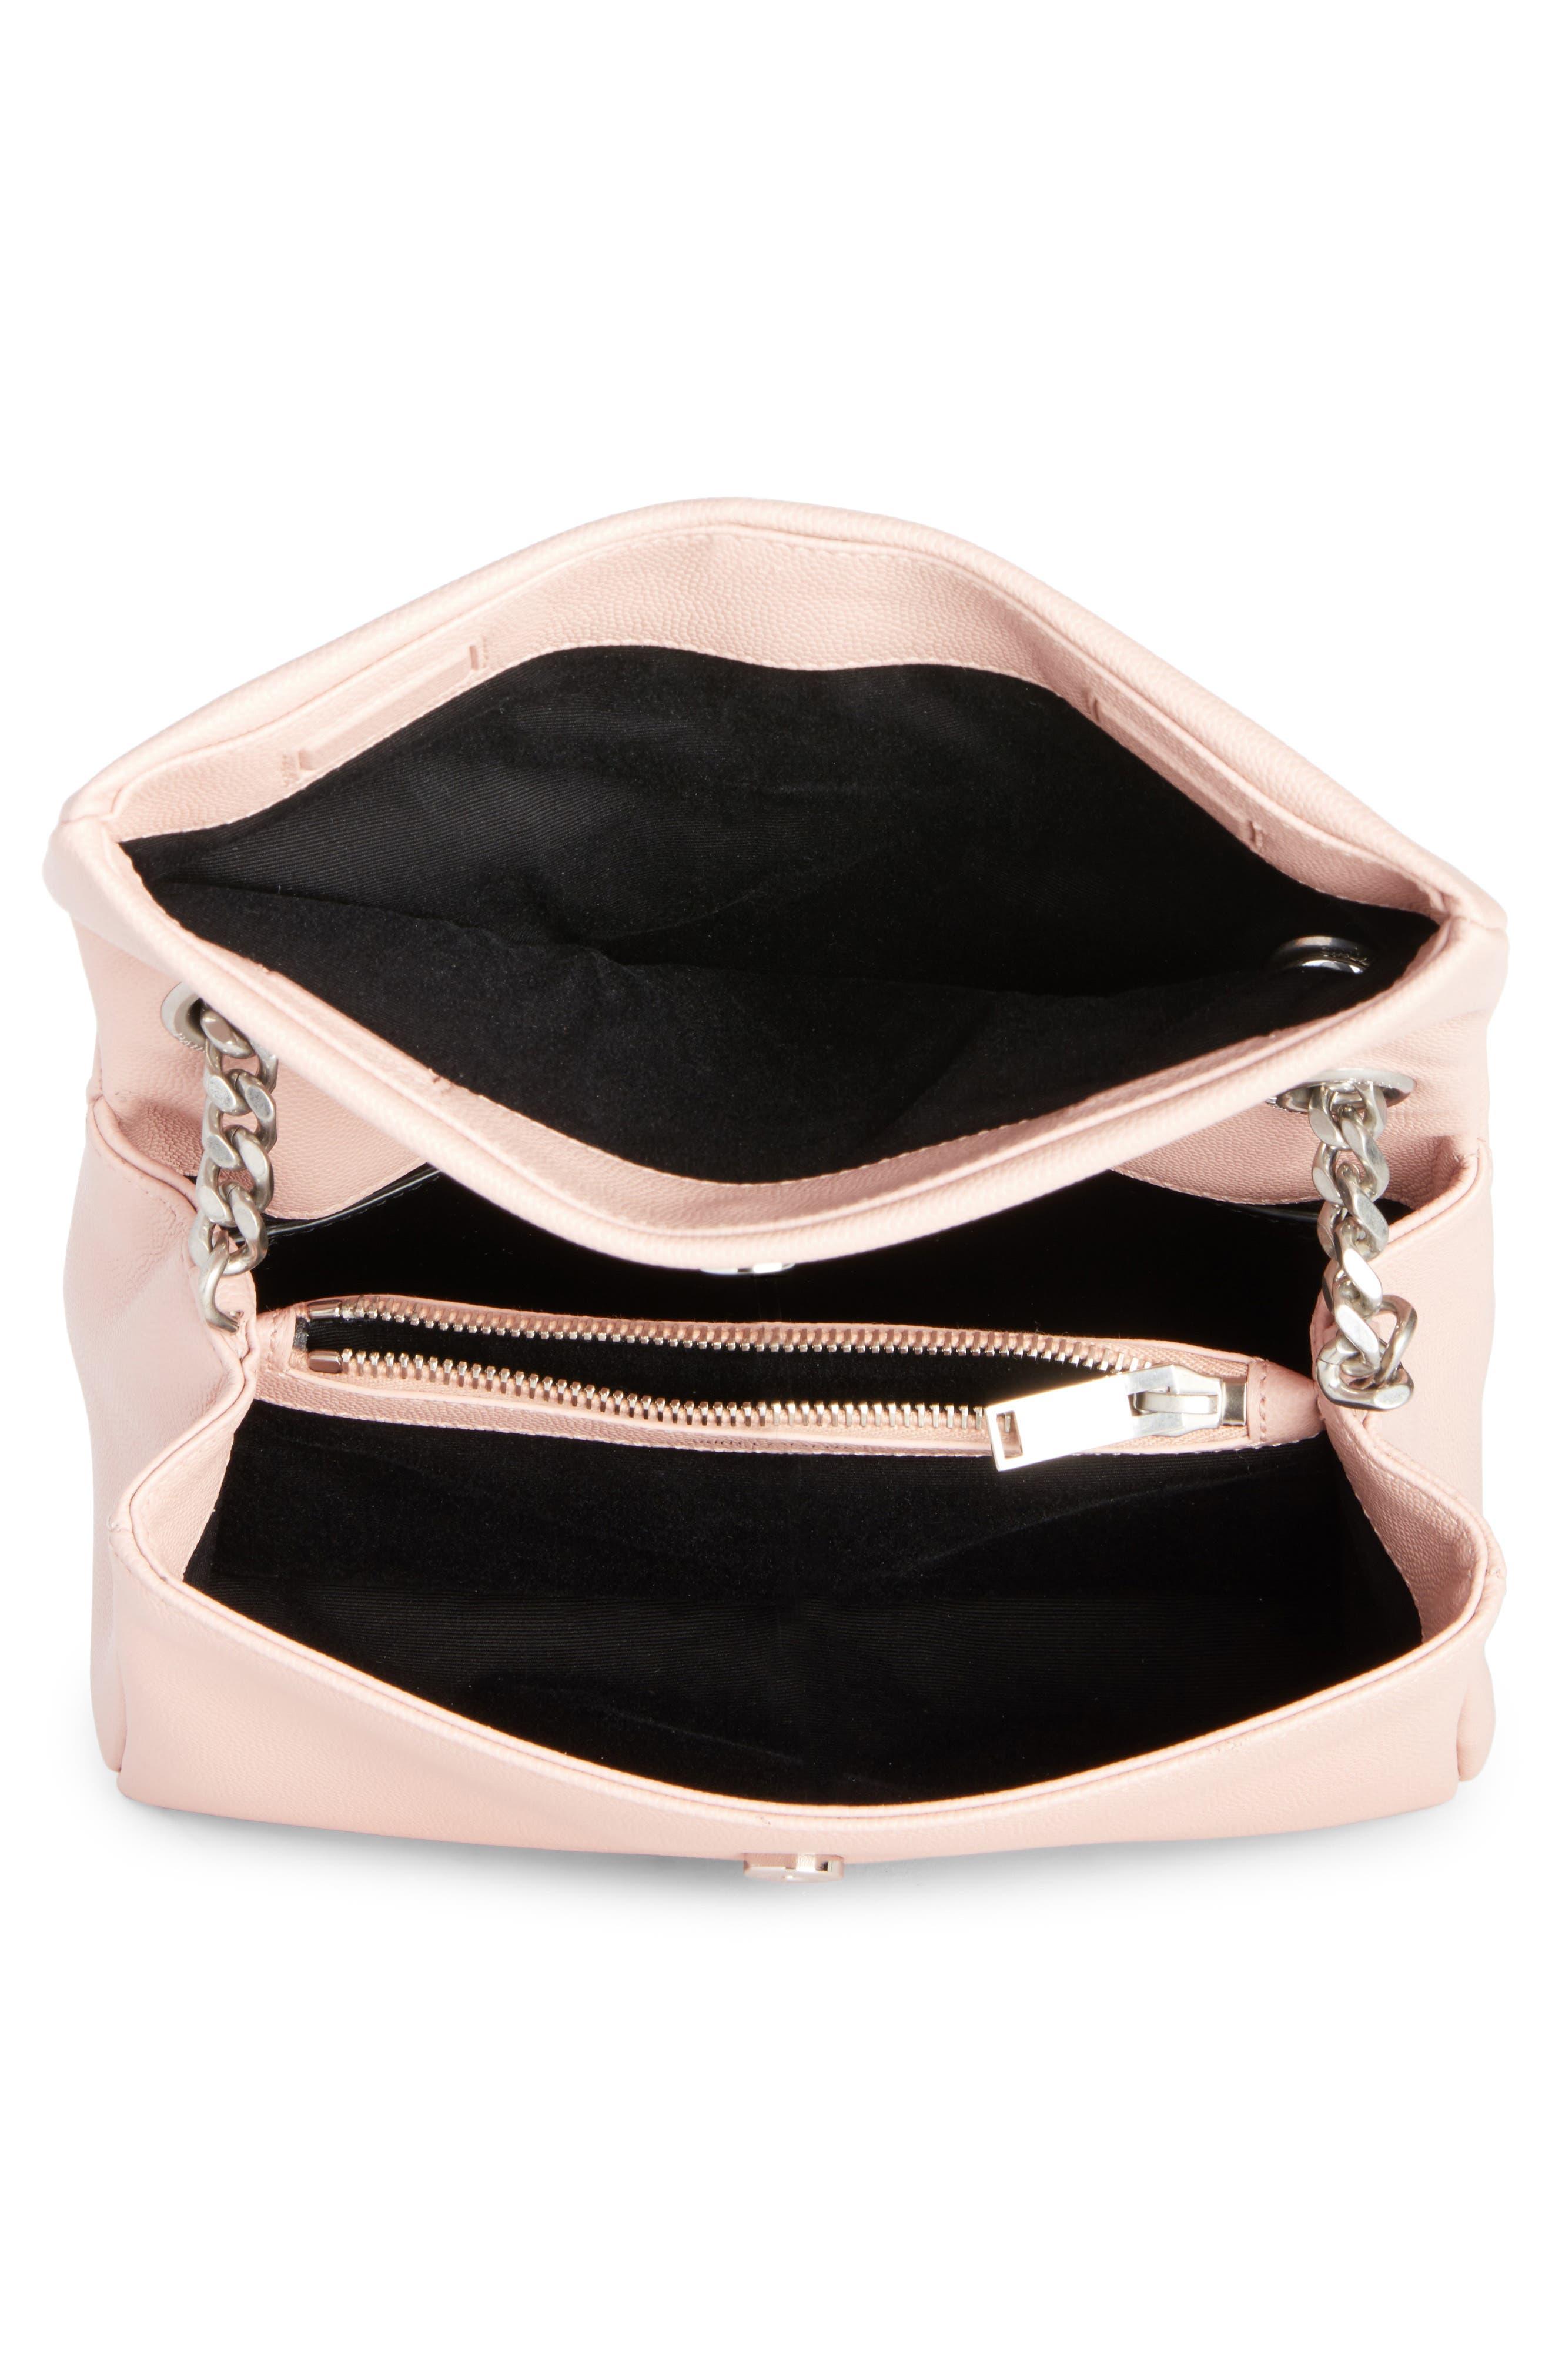 West Hollywood Calfskin Leather Messenger Bag,                             Alternate thumbnail 15, color,